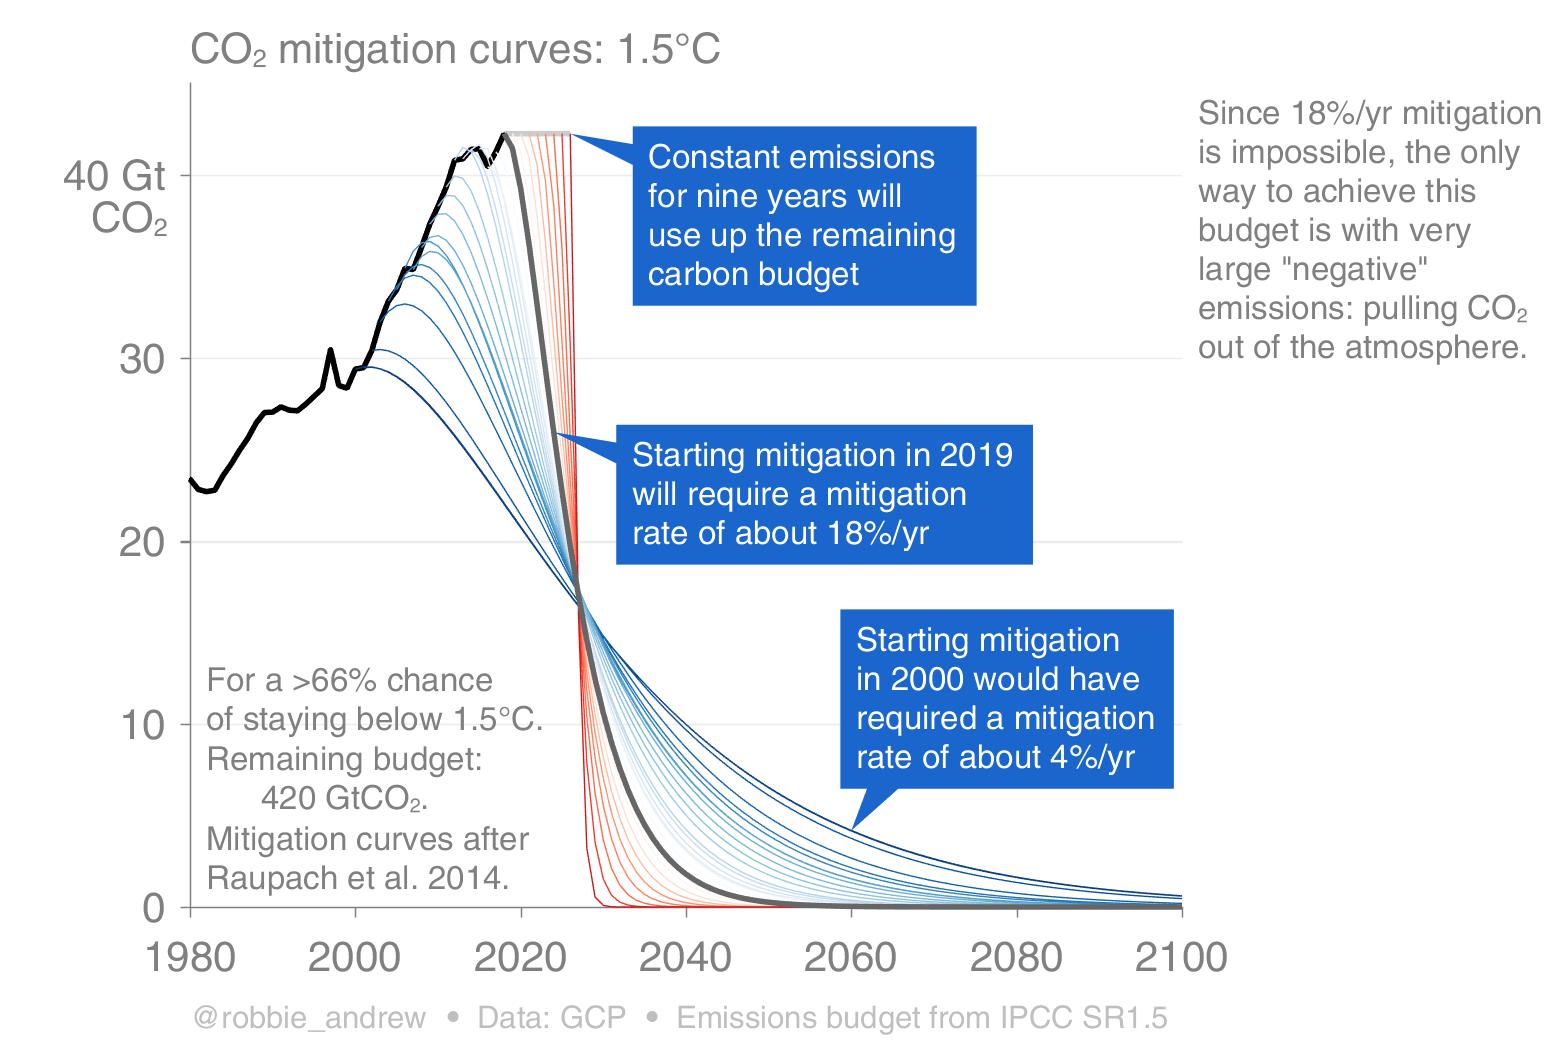 CO2 mitigation